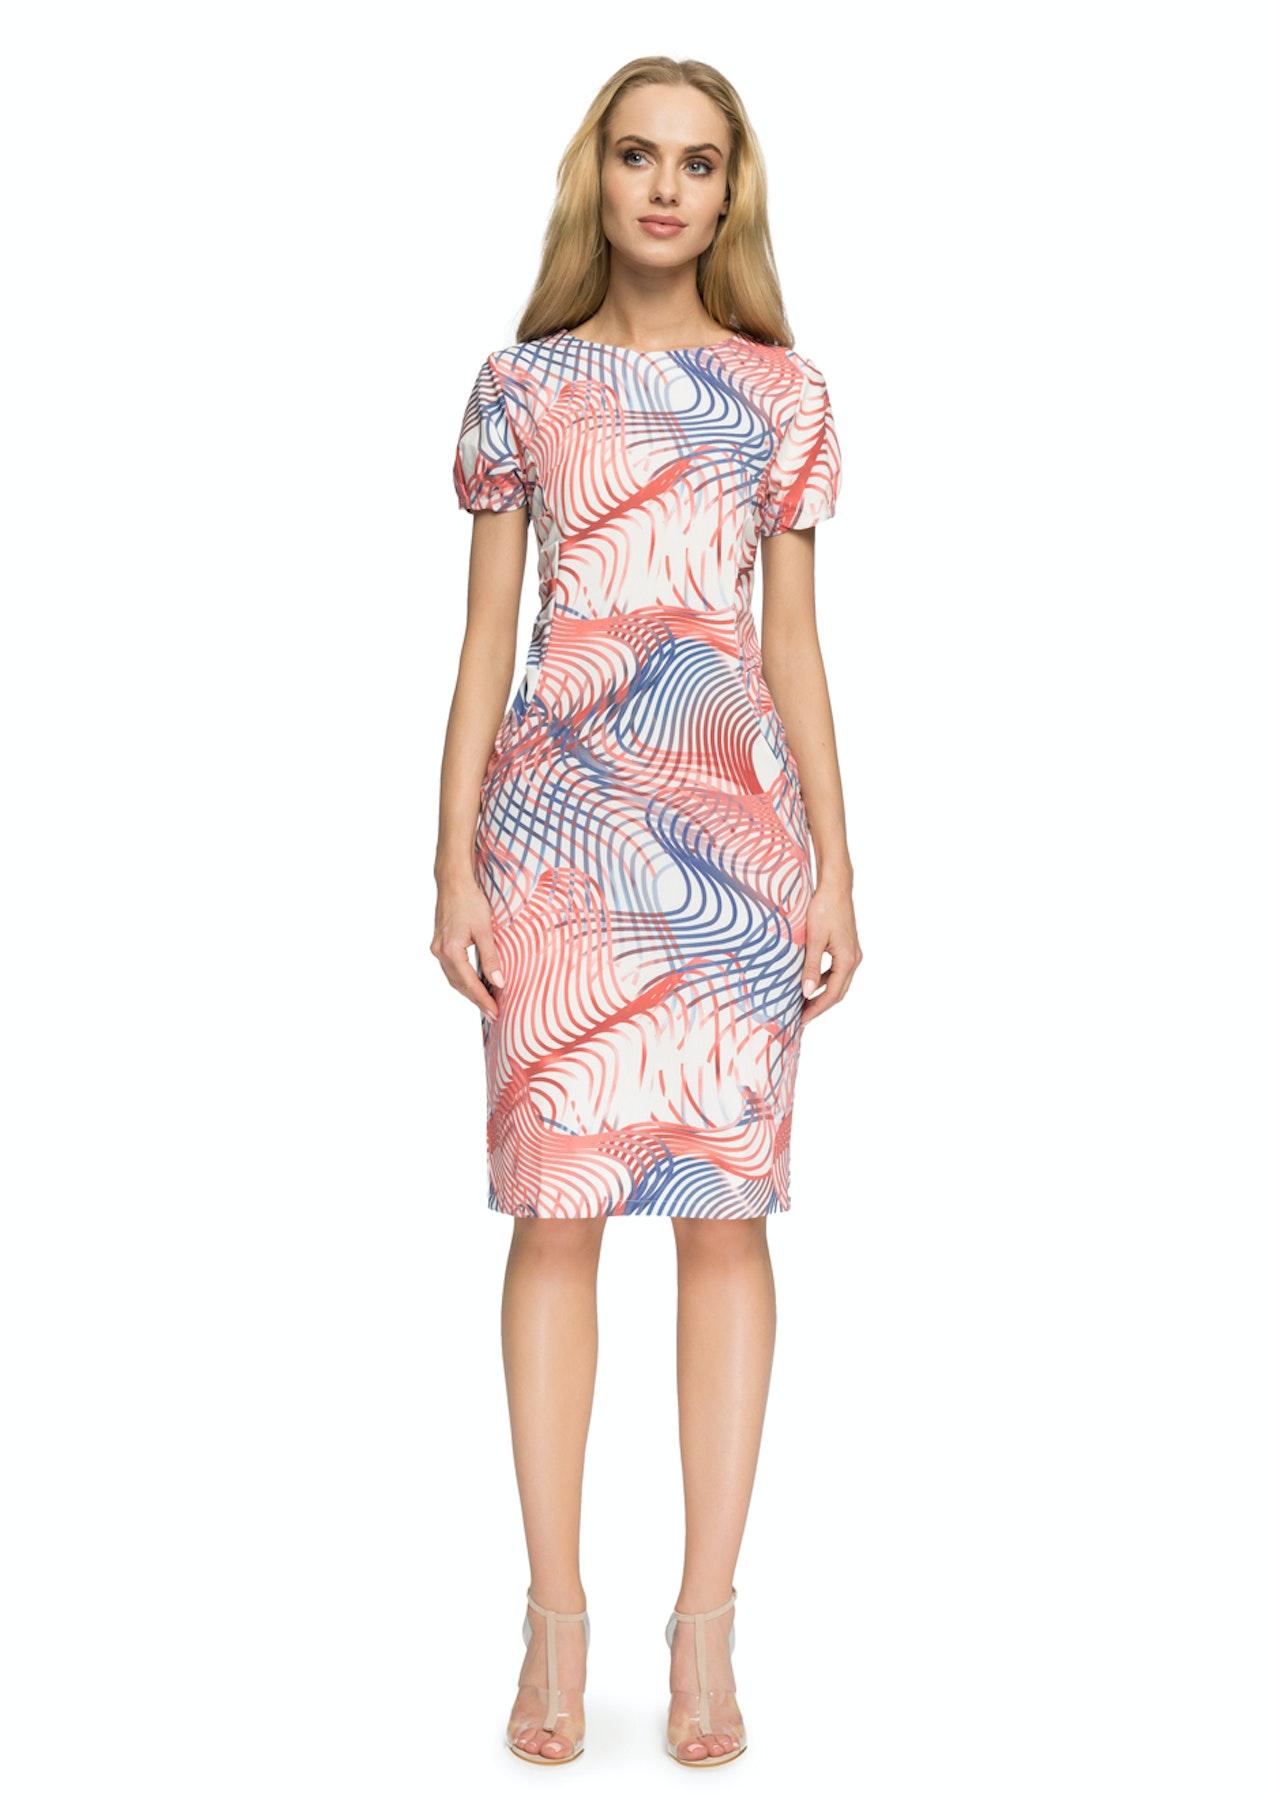 0546d354e4d Stylove - Woven Dress - Model 2 (Stripes